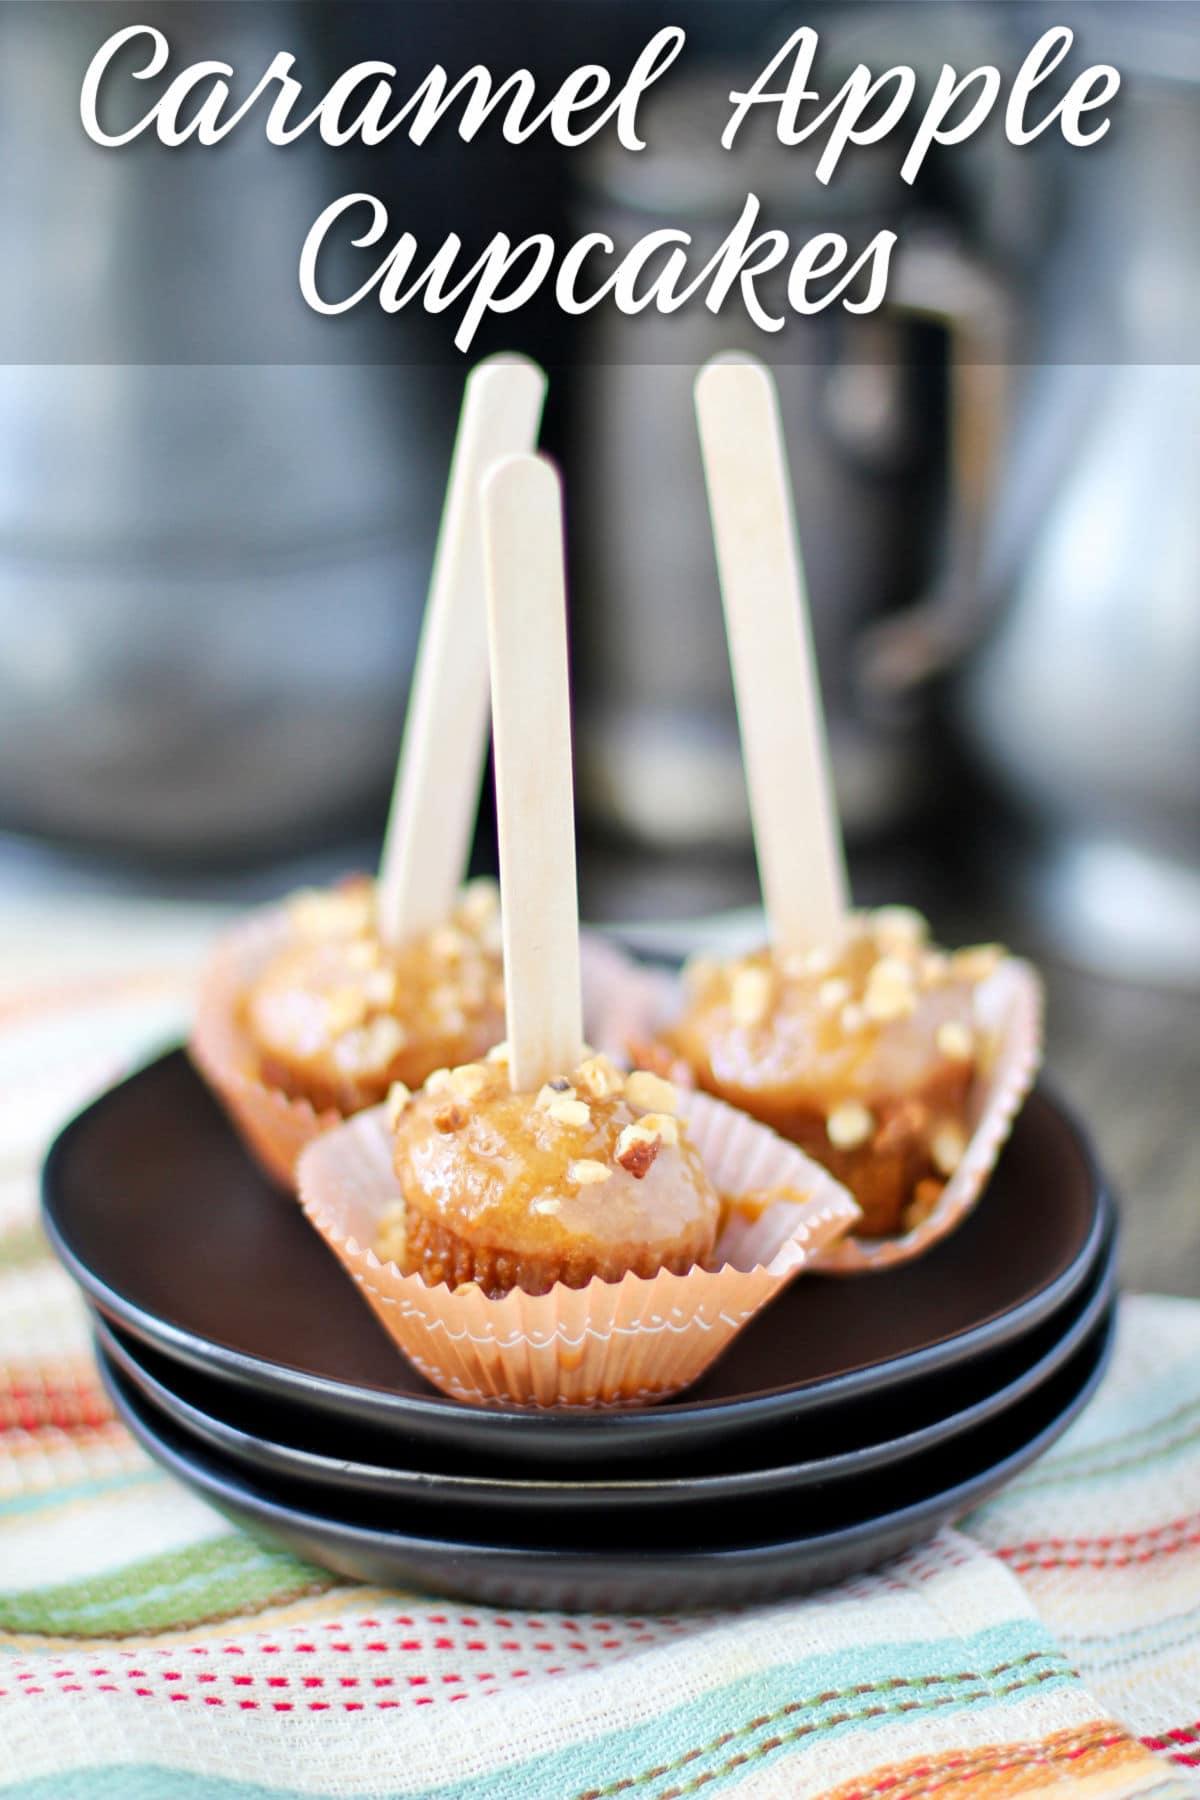 Caramel Apple Cupcakes on a plate.